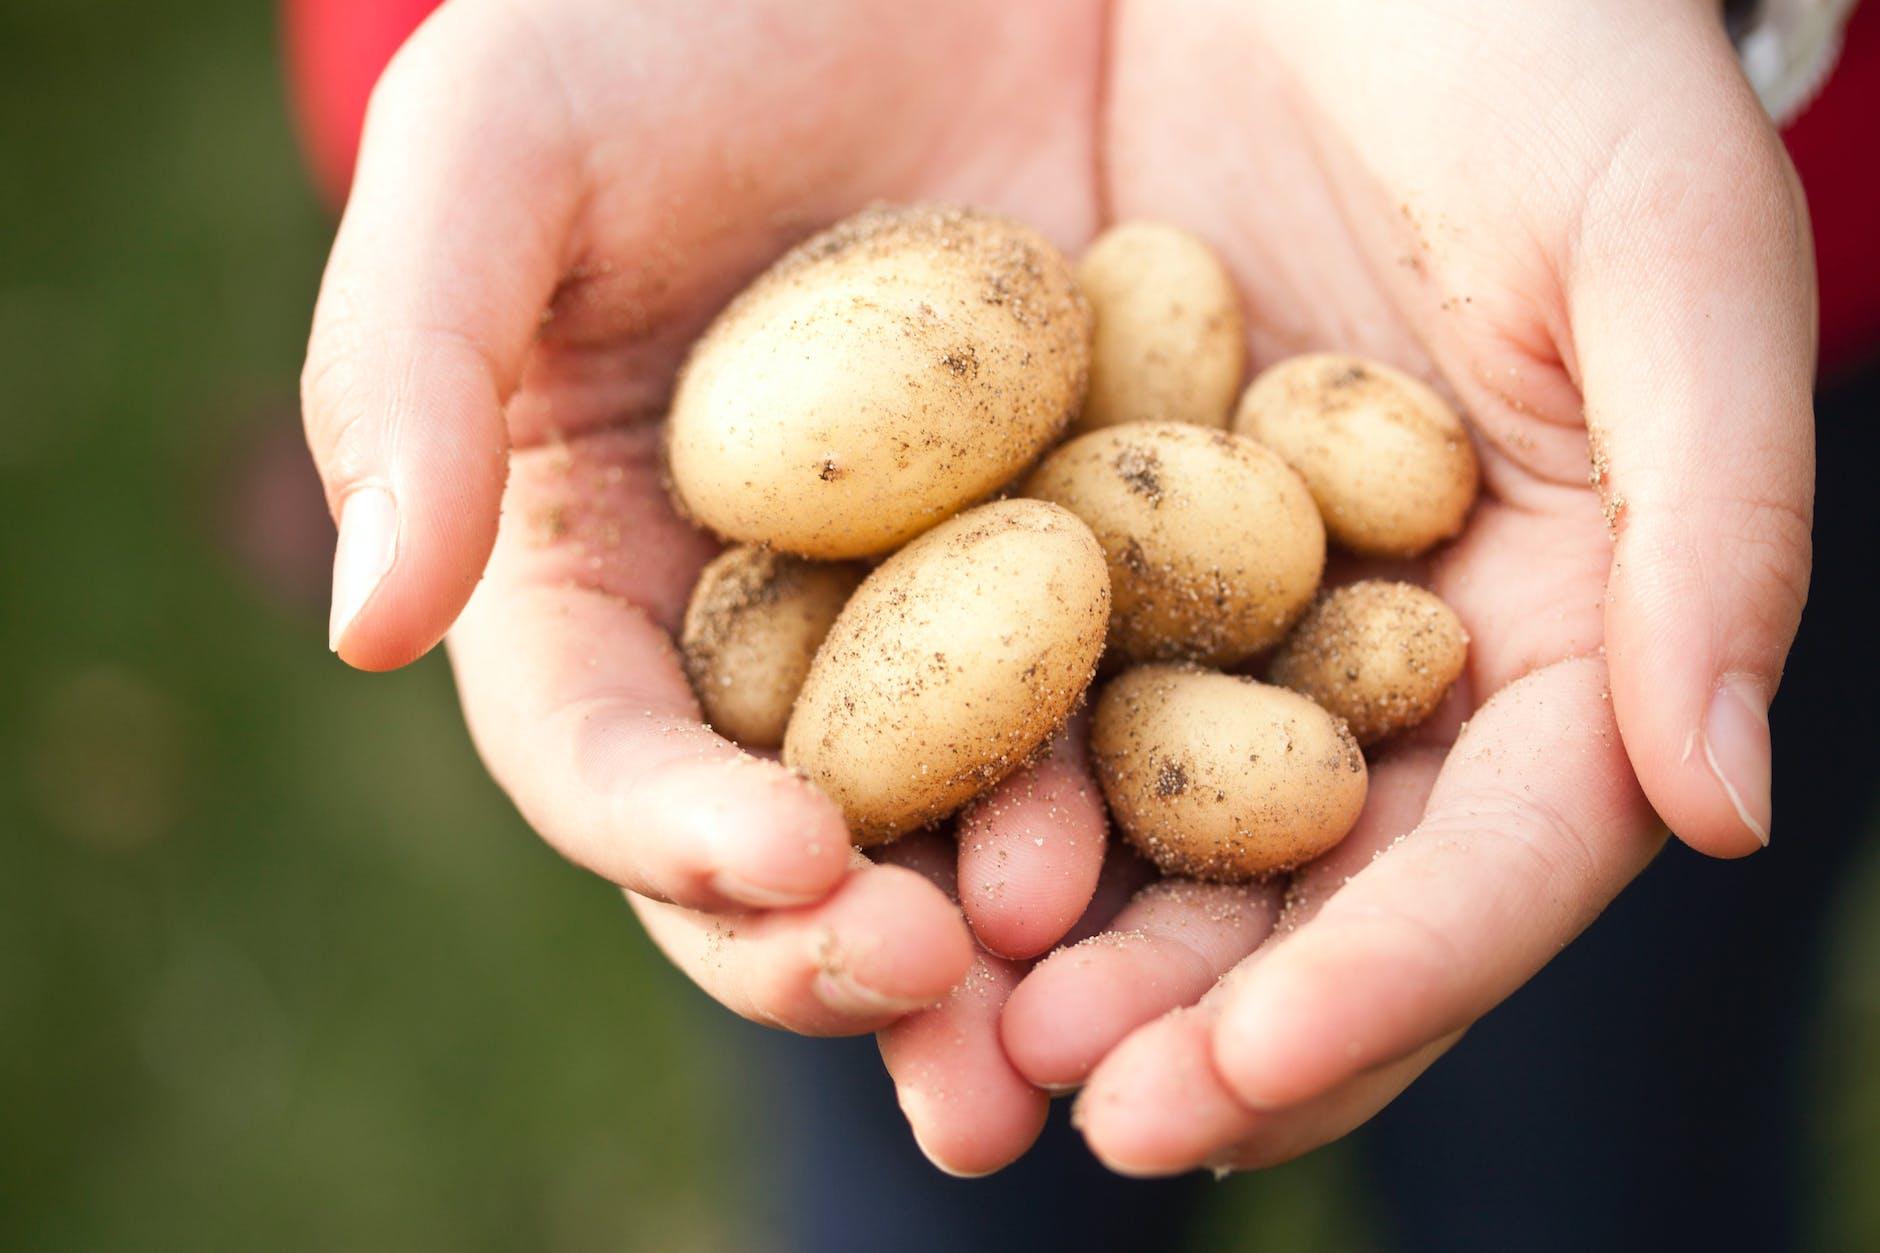 9 formas de cultivar tu propia comida. Cultiva tus propias papas.